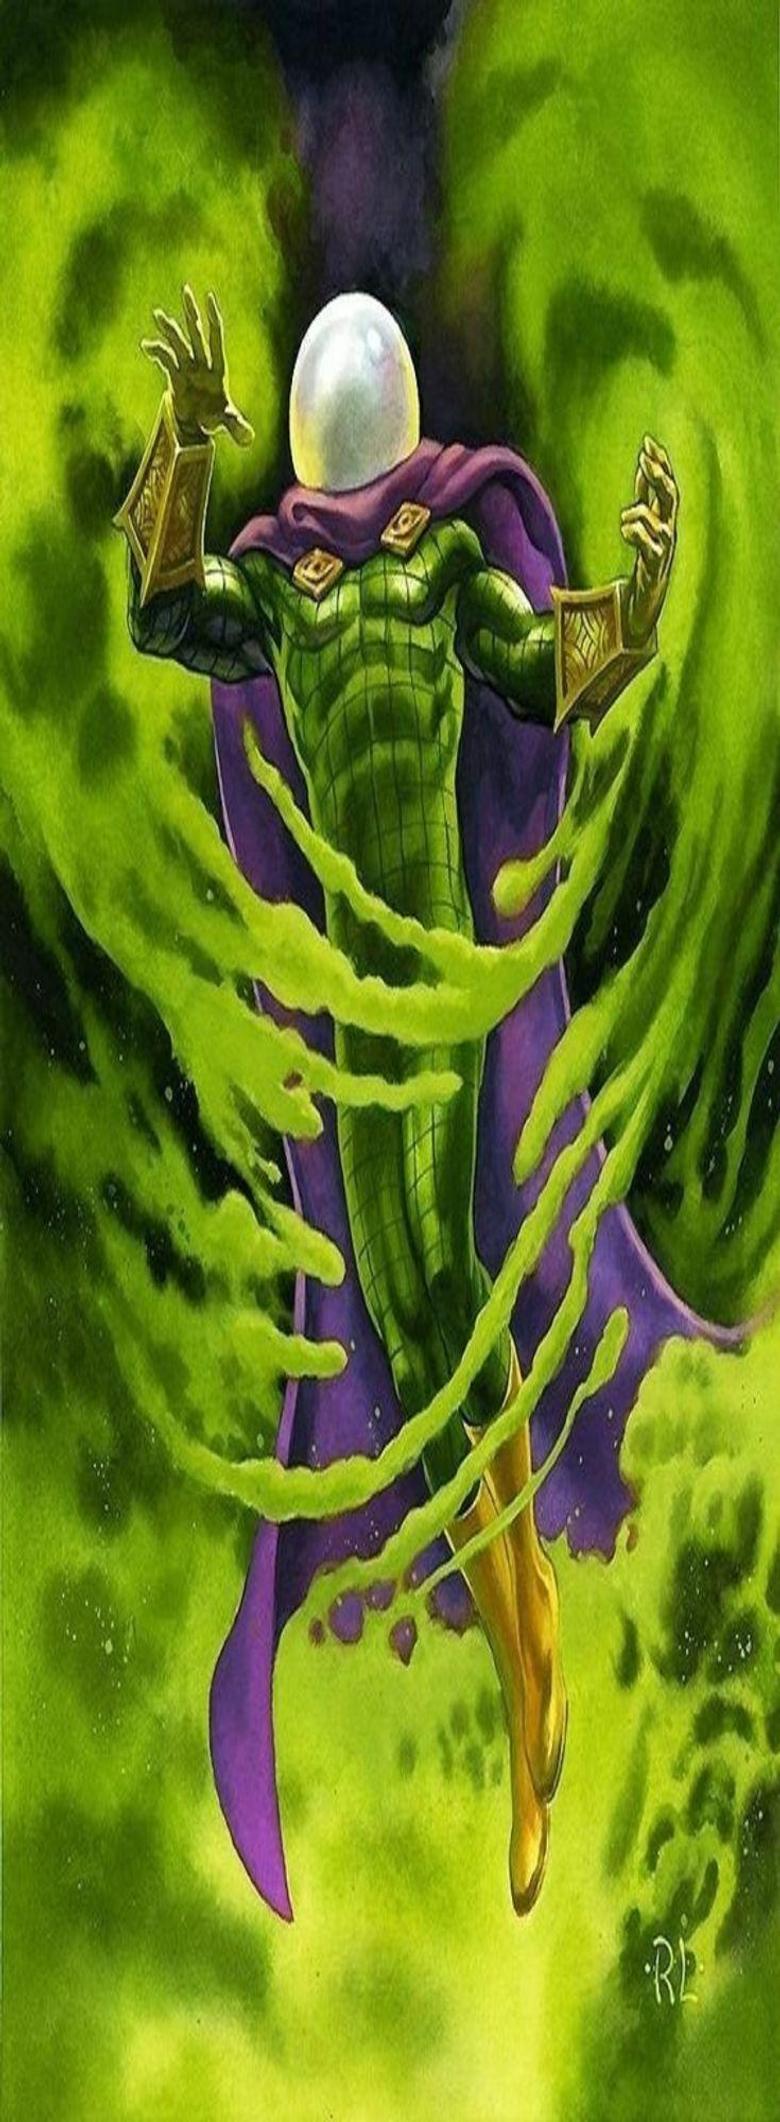 best Marvel Mysterio image